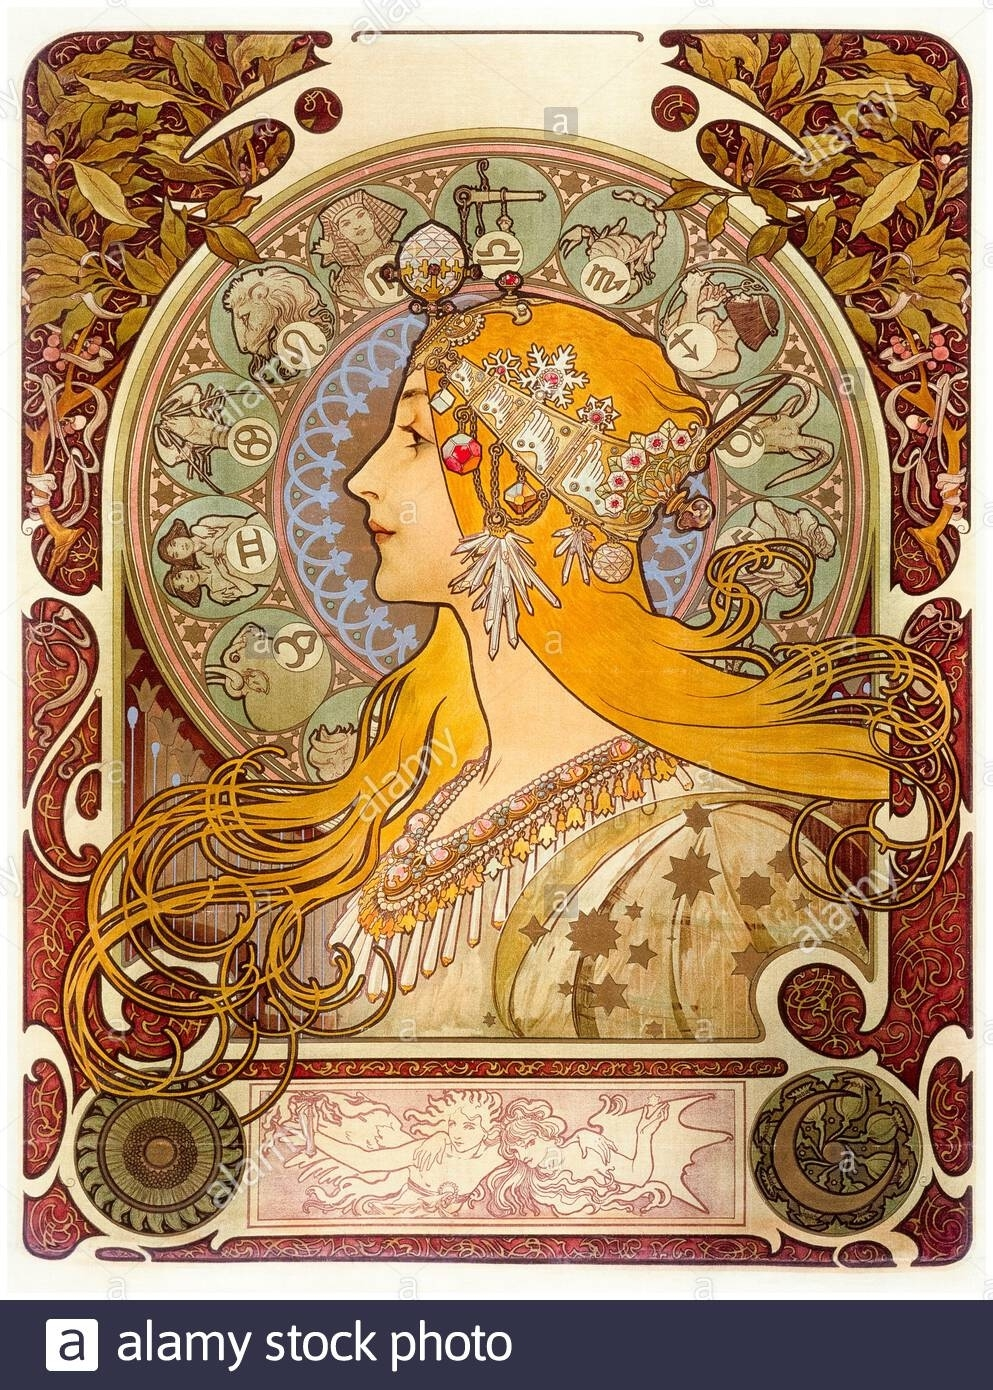 Alphonse Mucha, Zodiac, Art Nouveau Poster, 1896 Stock Photo Zodiac Calendar By Alphonse Mucha